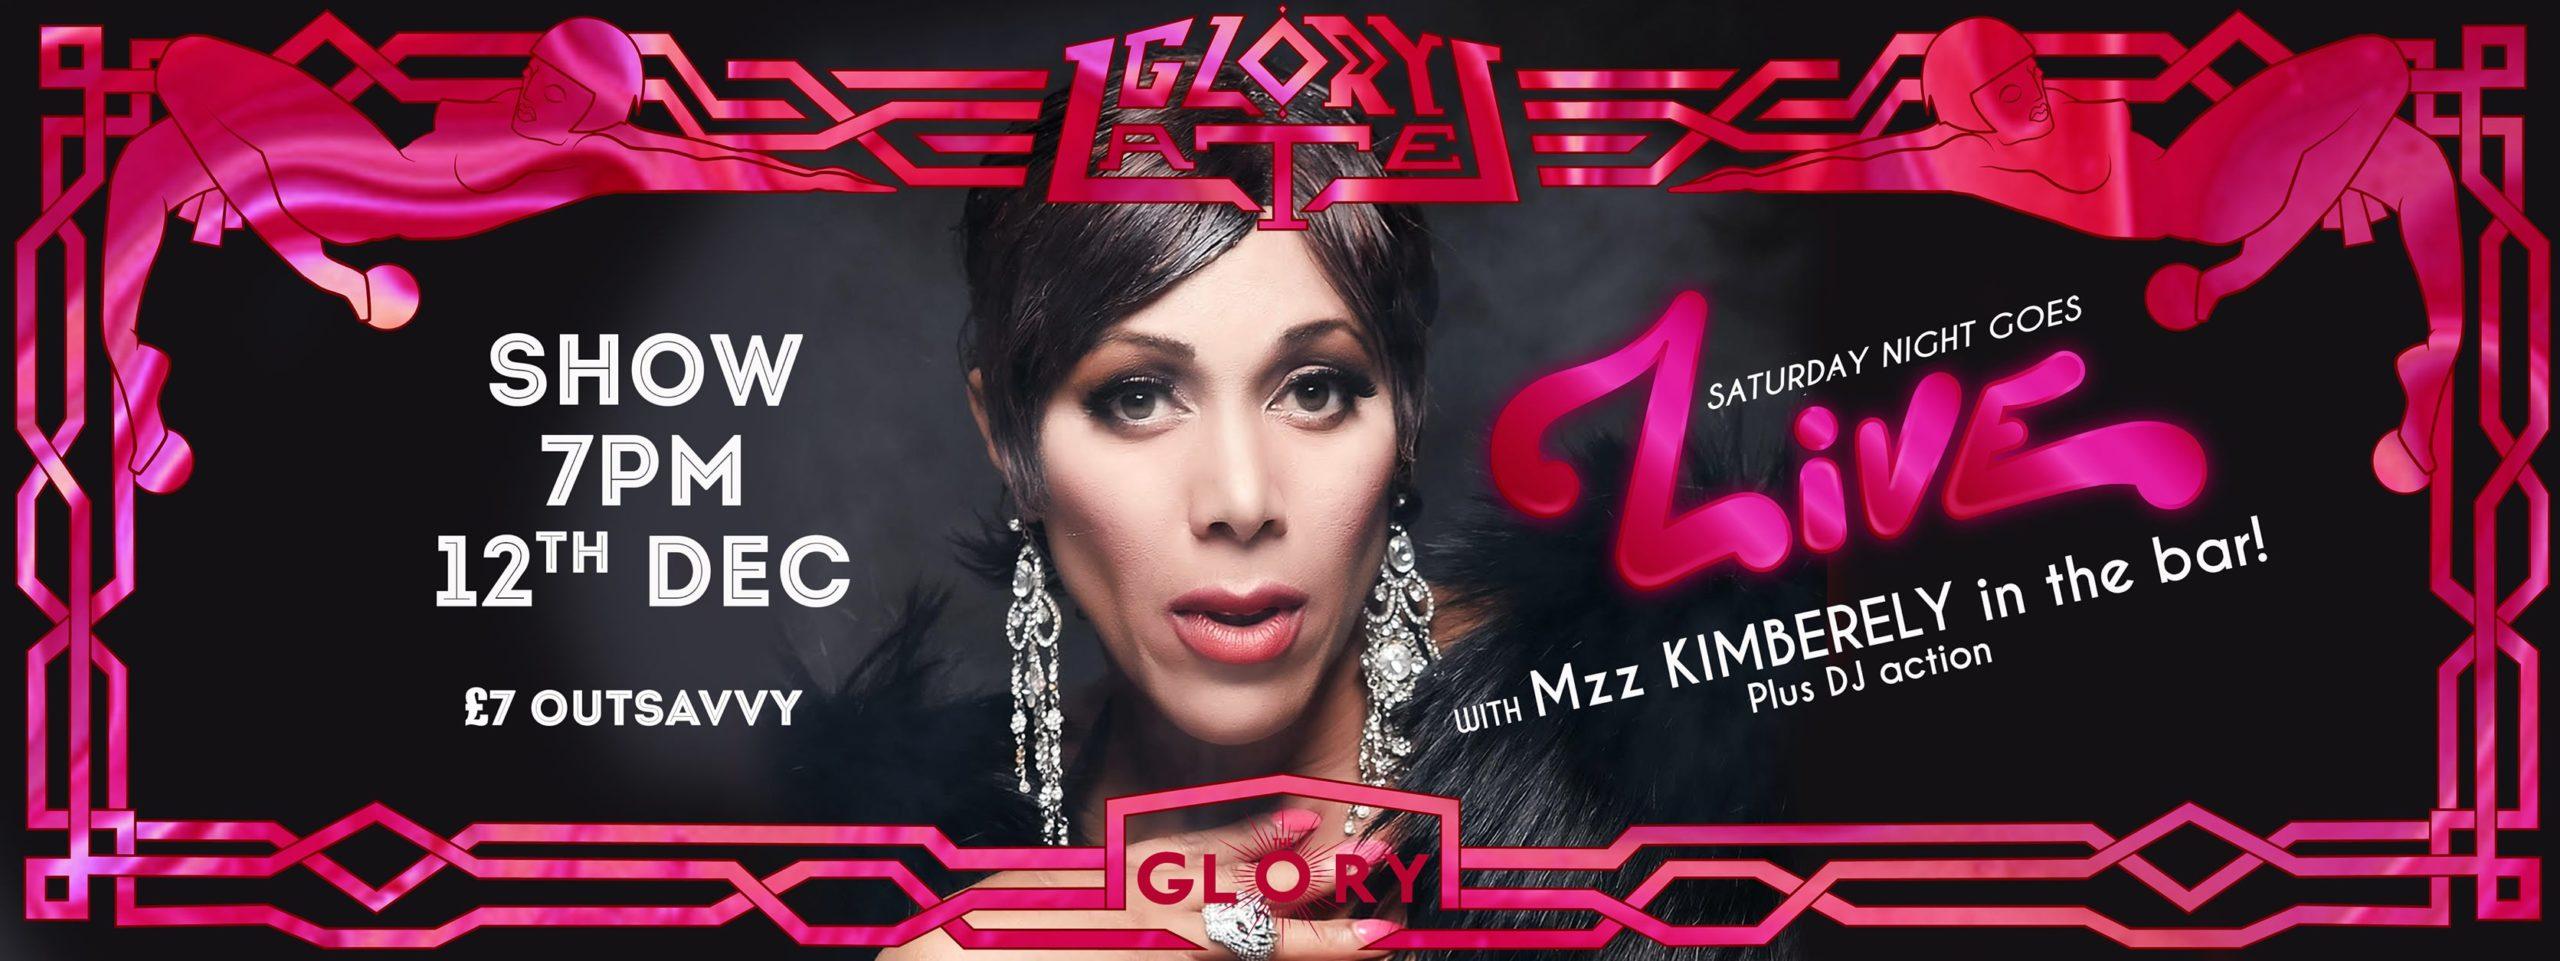 Glory Lates with Mzz Kimberley